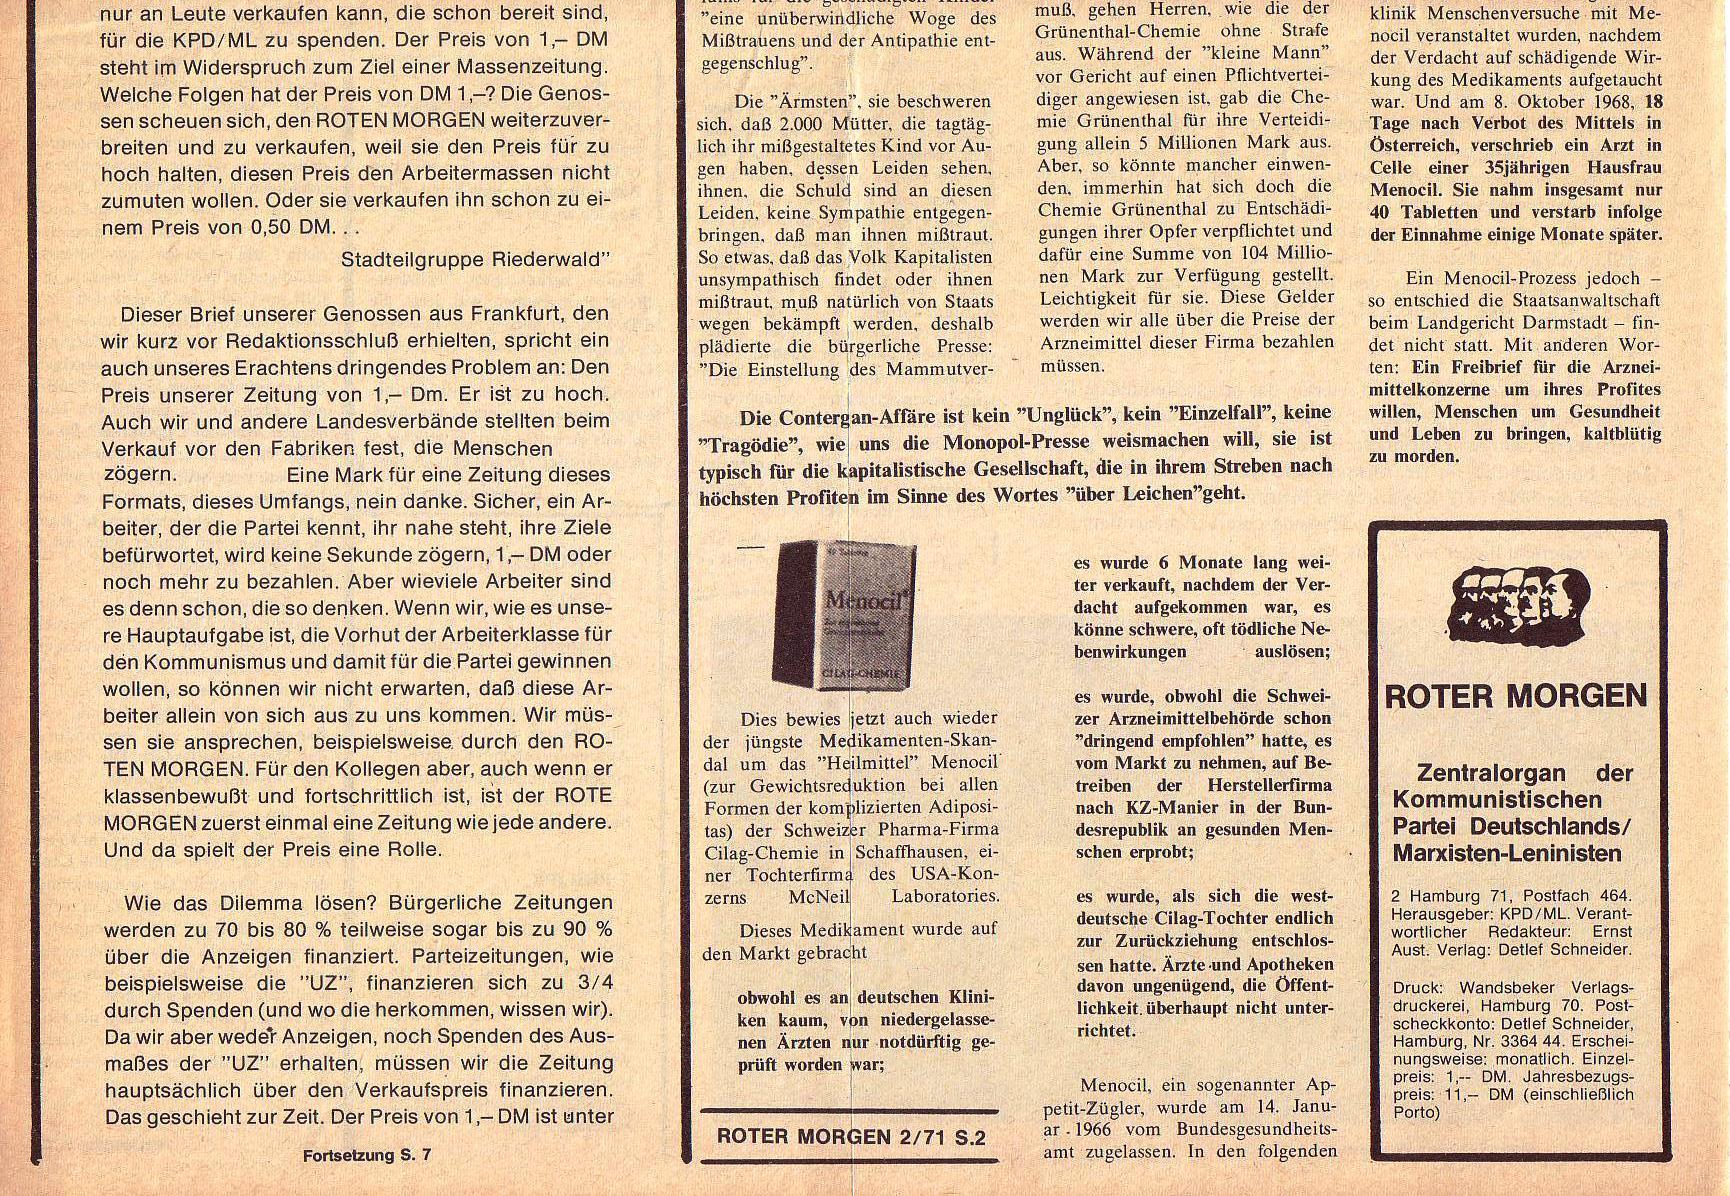 Roter Morgen, 5. Jg., Februar 1971, Nr. 2, Seite 2b